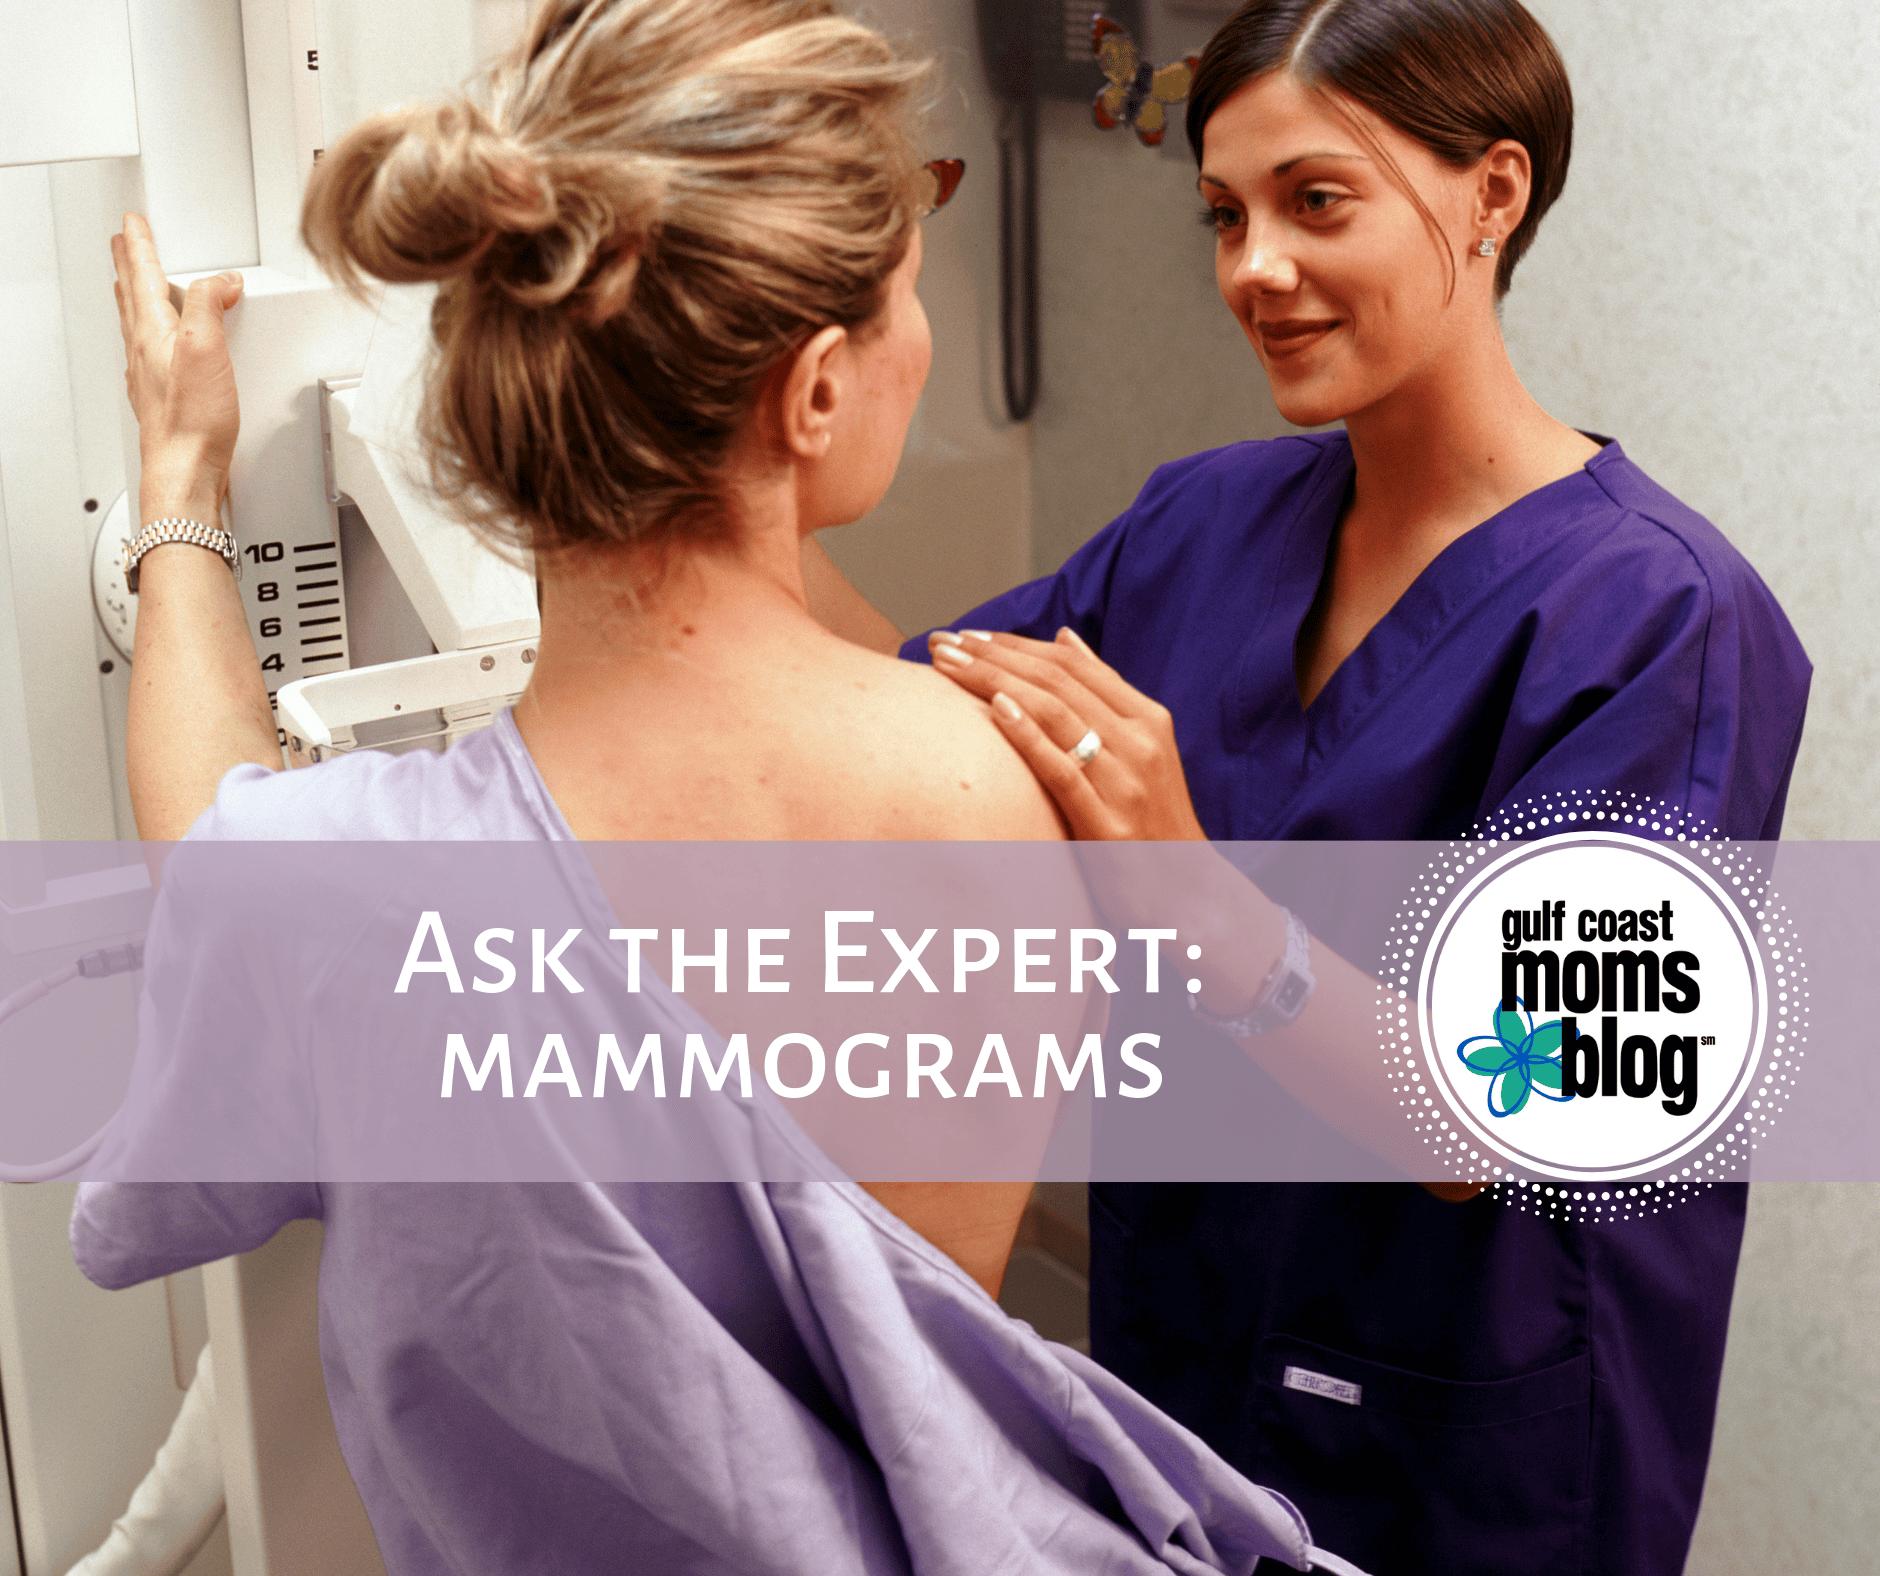 Ask the Expert: Mammograms